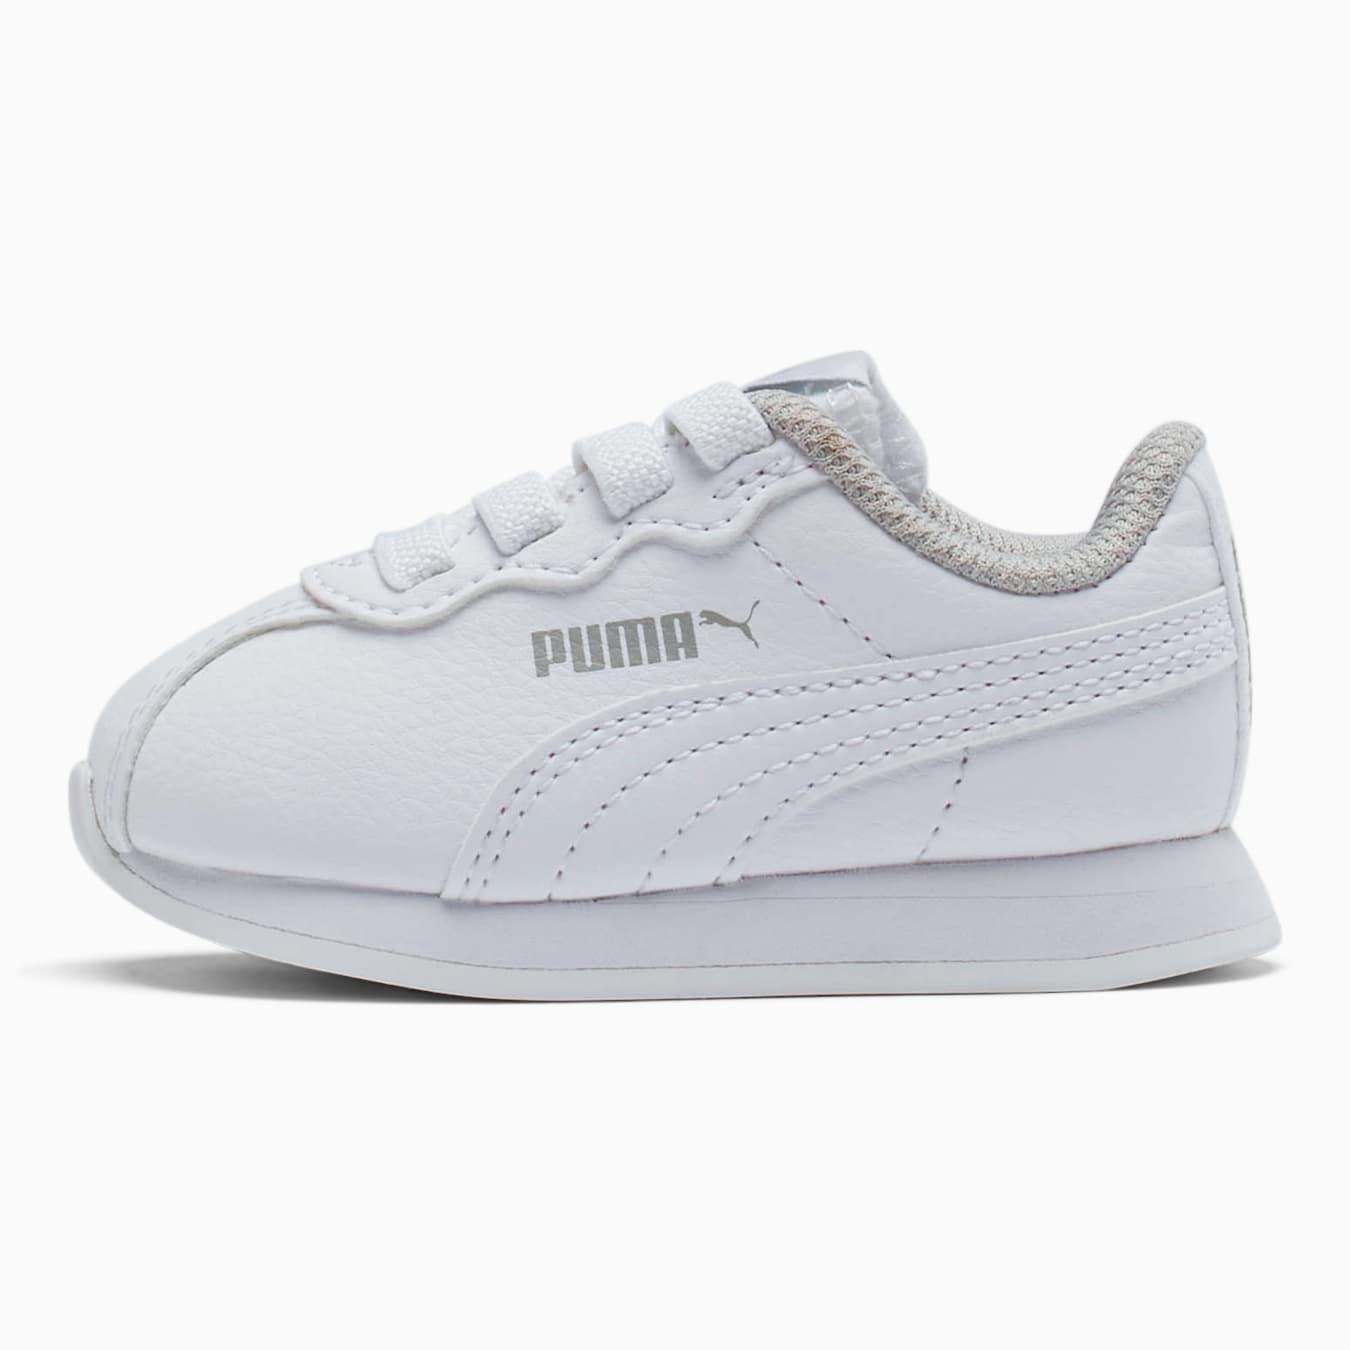 Puma Kids': Toddler Turin II Shoe $12.74, Little Kids' Vikky v2 Glitz 2 Shoe $14.99, MOre + Free Shipping on $50+